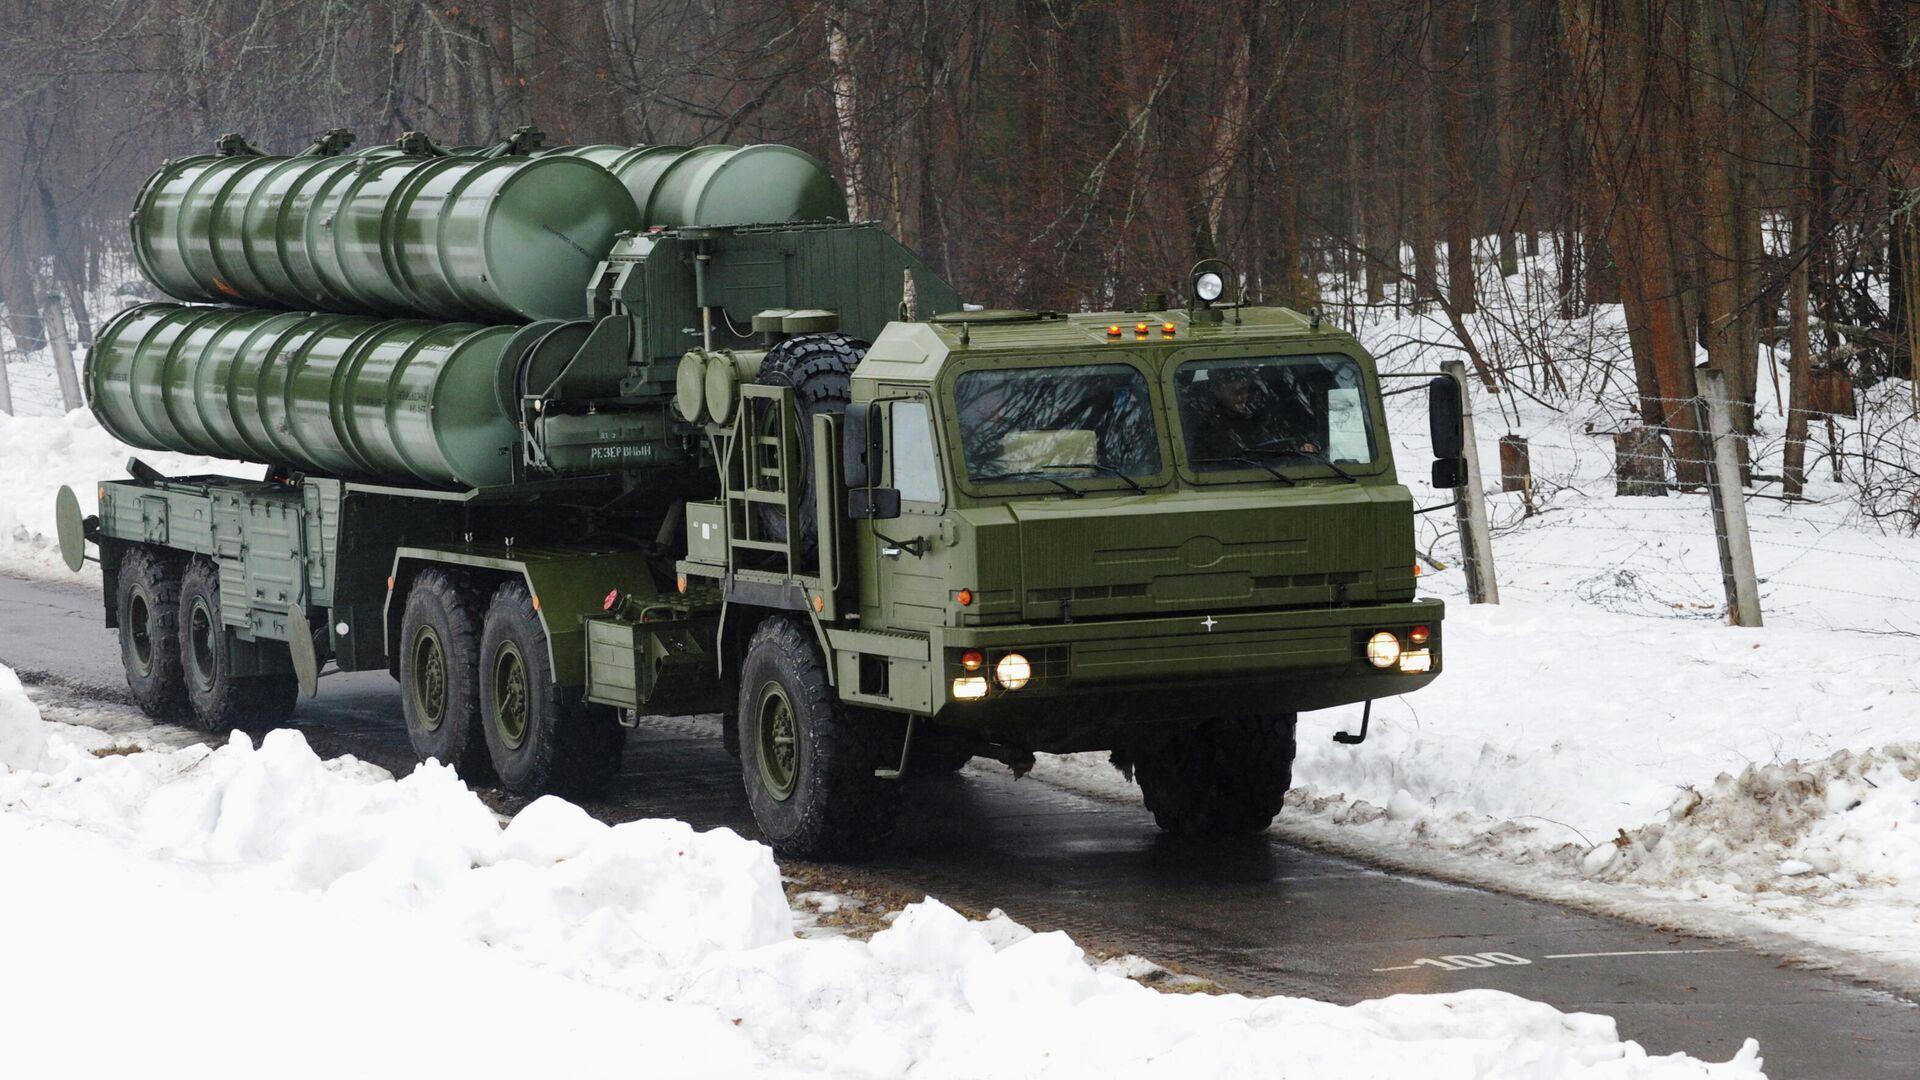 Пусковая установка зенитно-ракетного комплекса С-400 Триумф  - РИА Новости, 1920, 08.03.2021